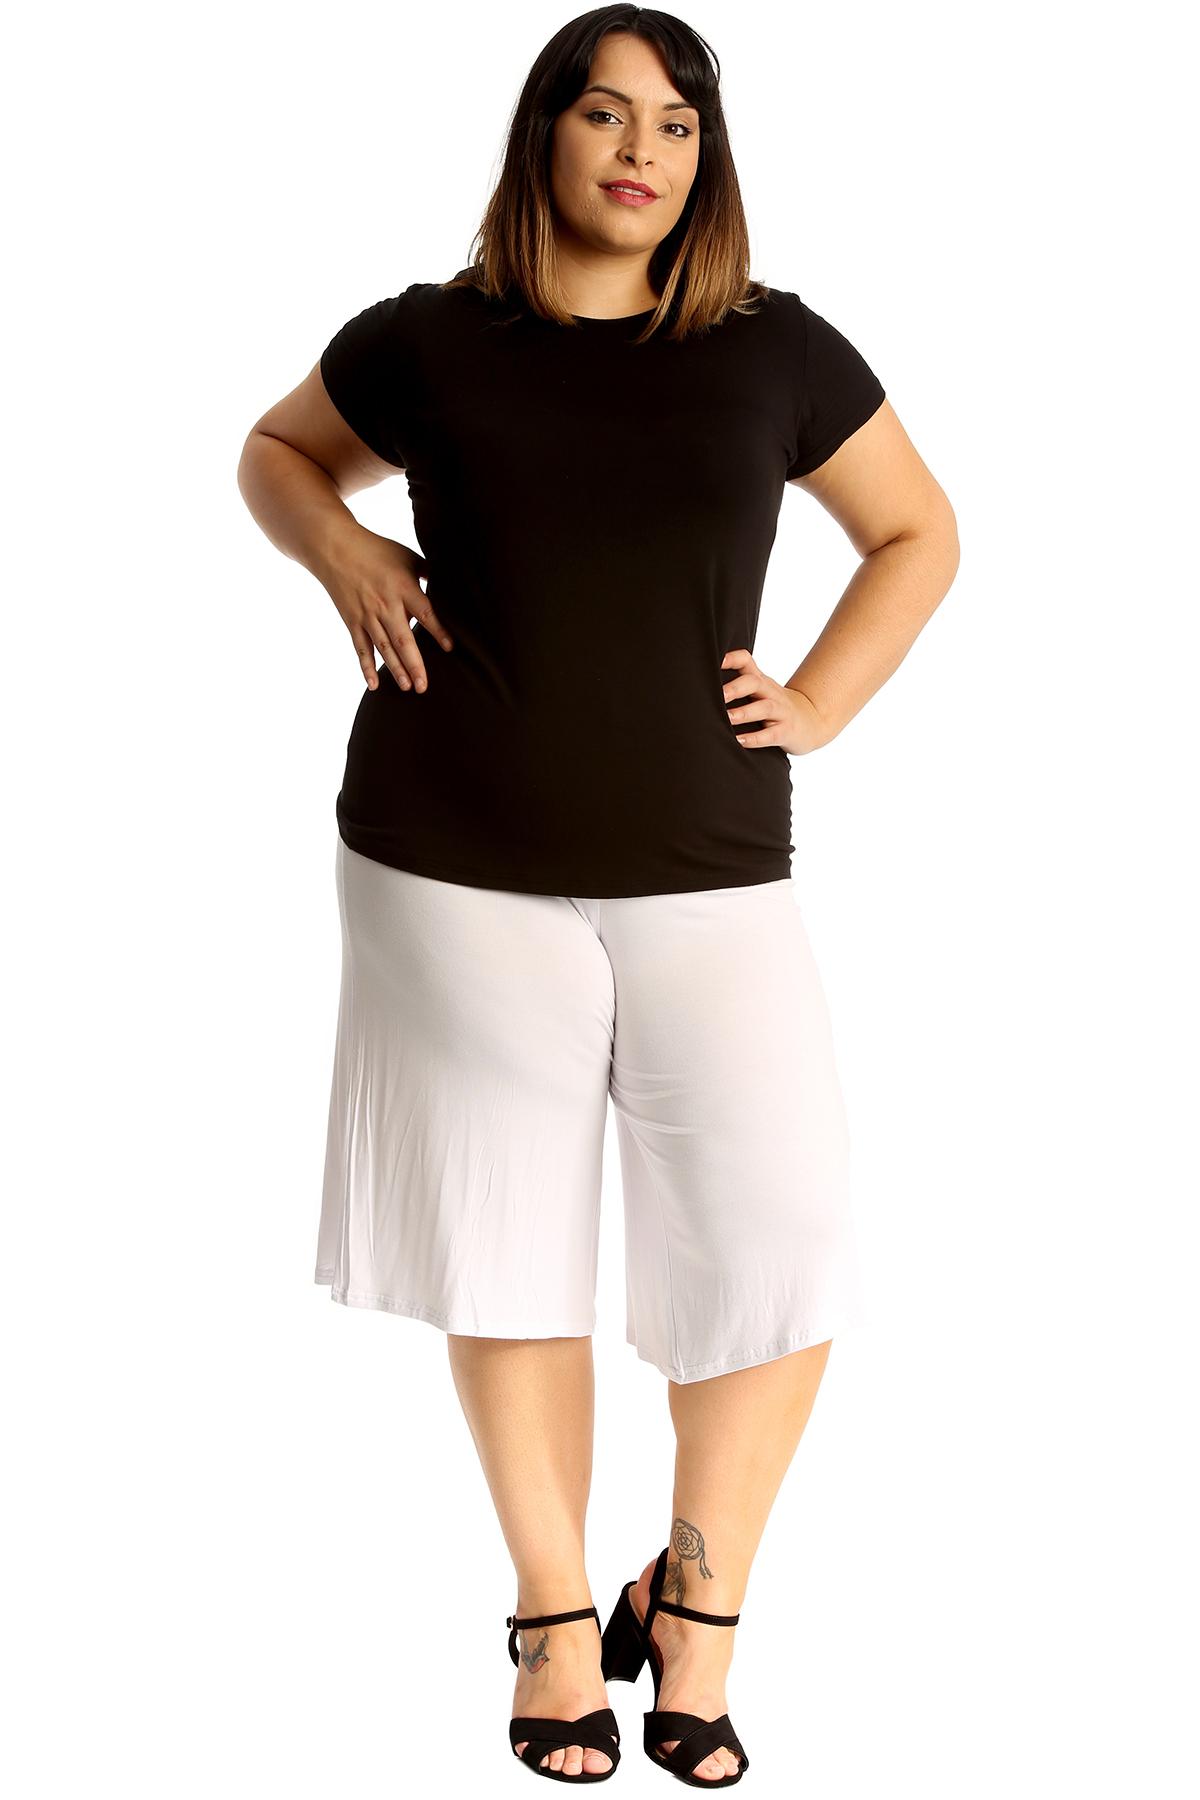 New-Womens-Plus-Size-Culottes-Ladies-Plain-Shorts-Palazzo-Elastic-Pants-Summer thumbnail 42